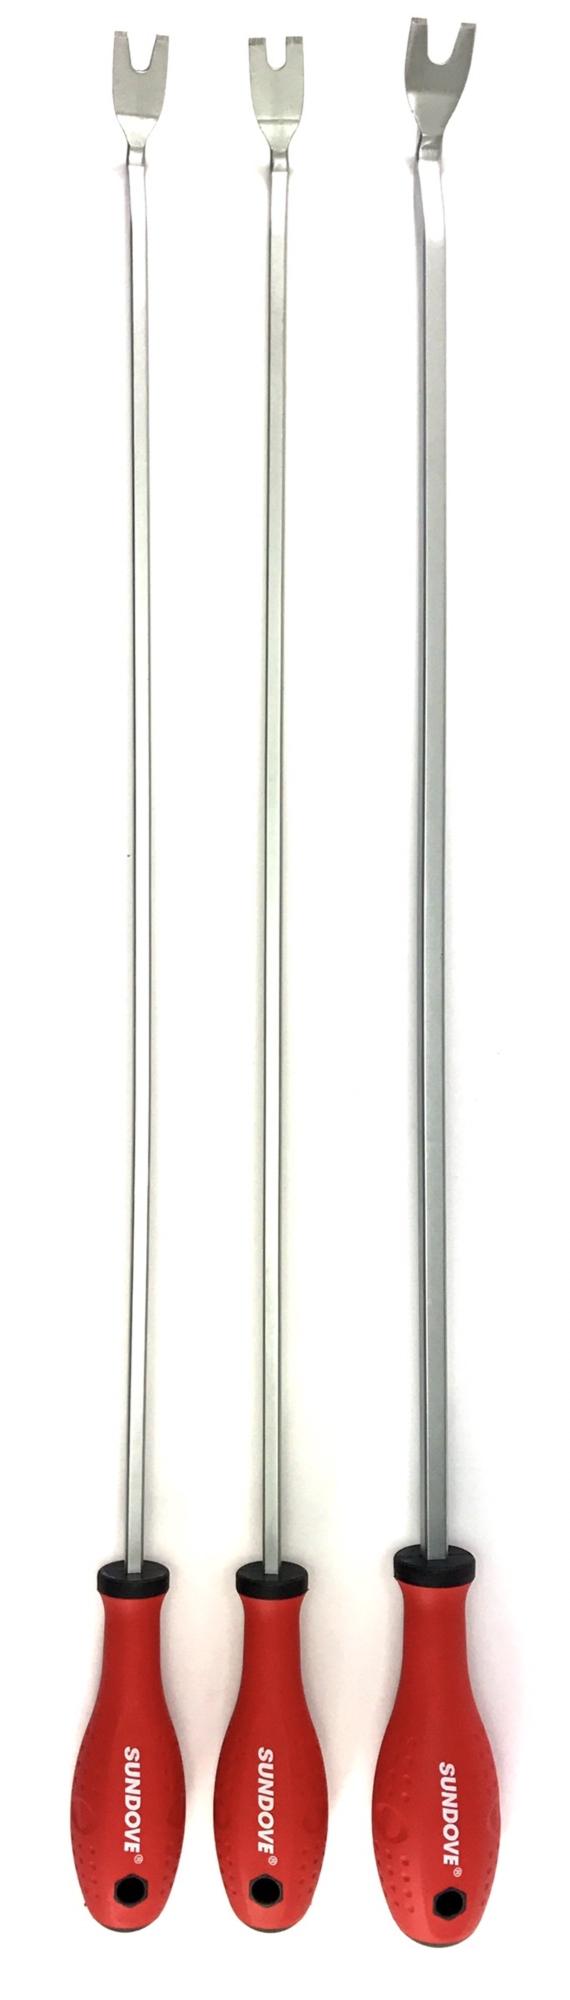 U-Slot Door Upholstery Panel Removal 500mm